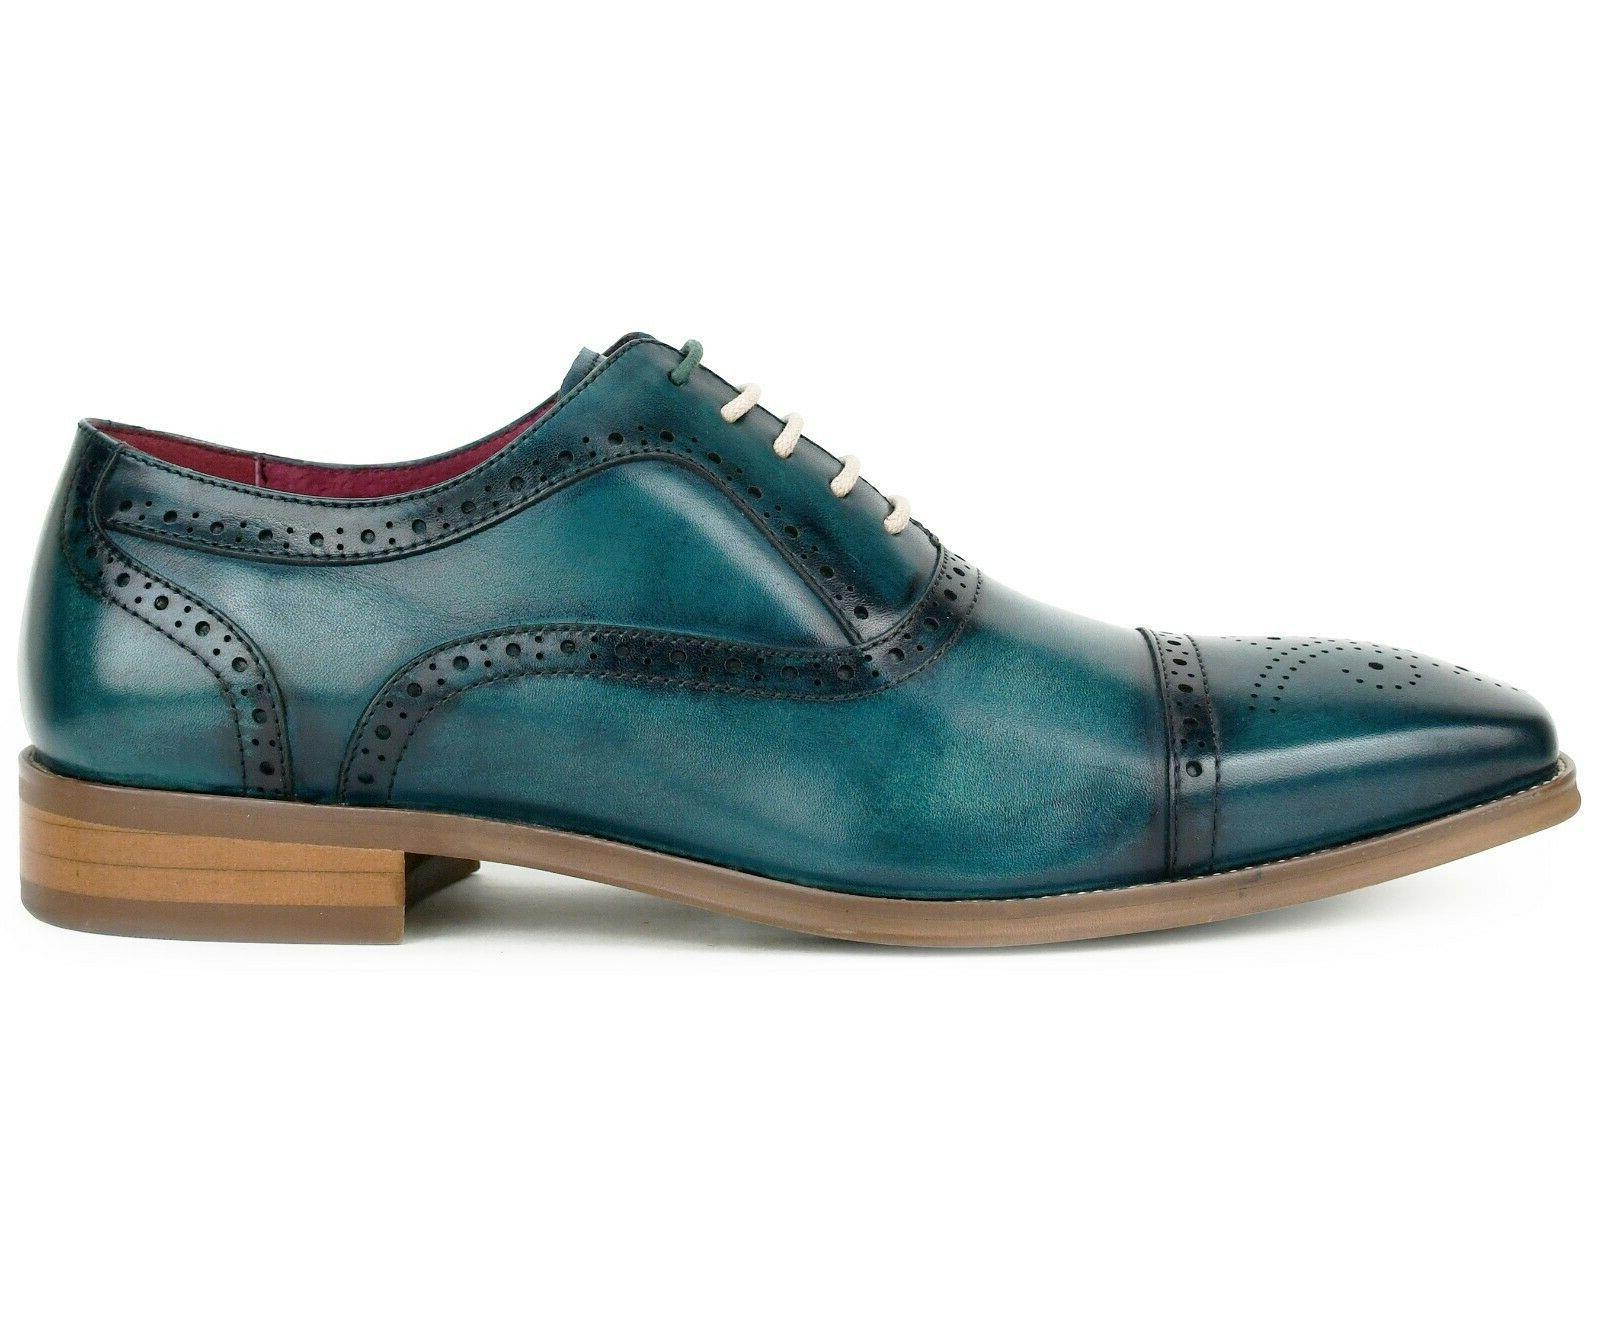 Men's Dress Shoes Genuine Leather Oxfords, Dress